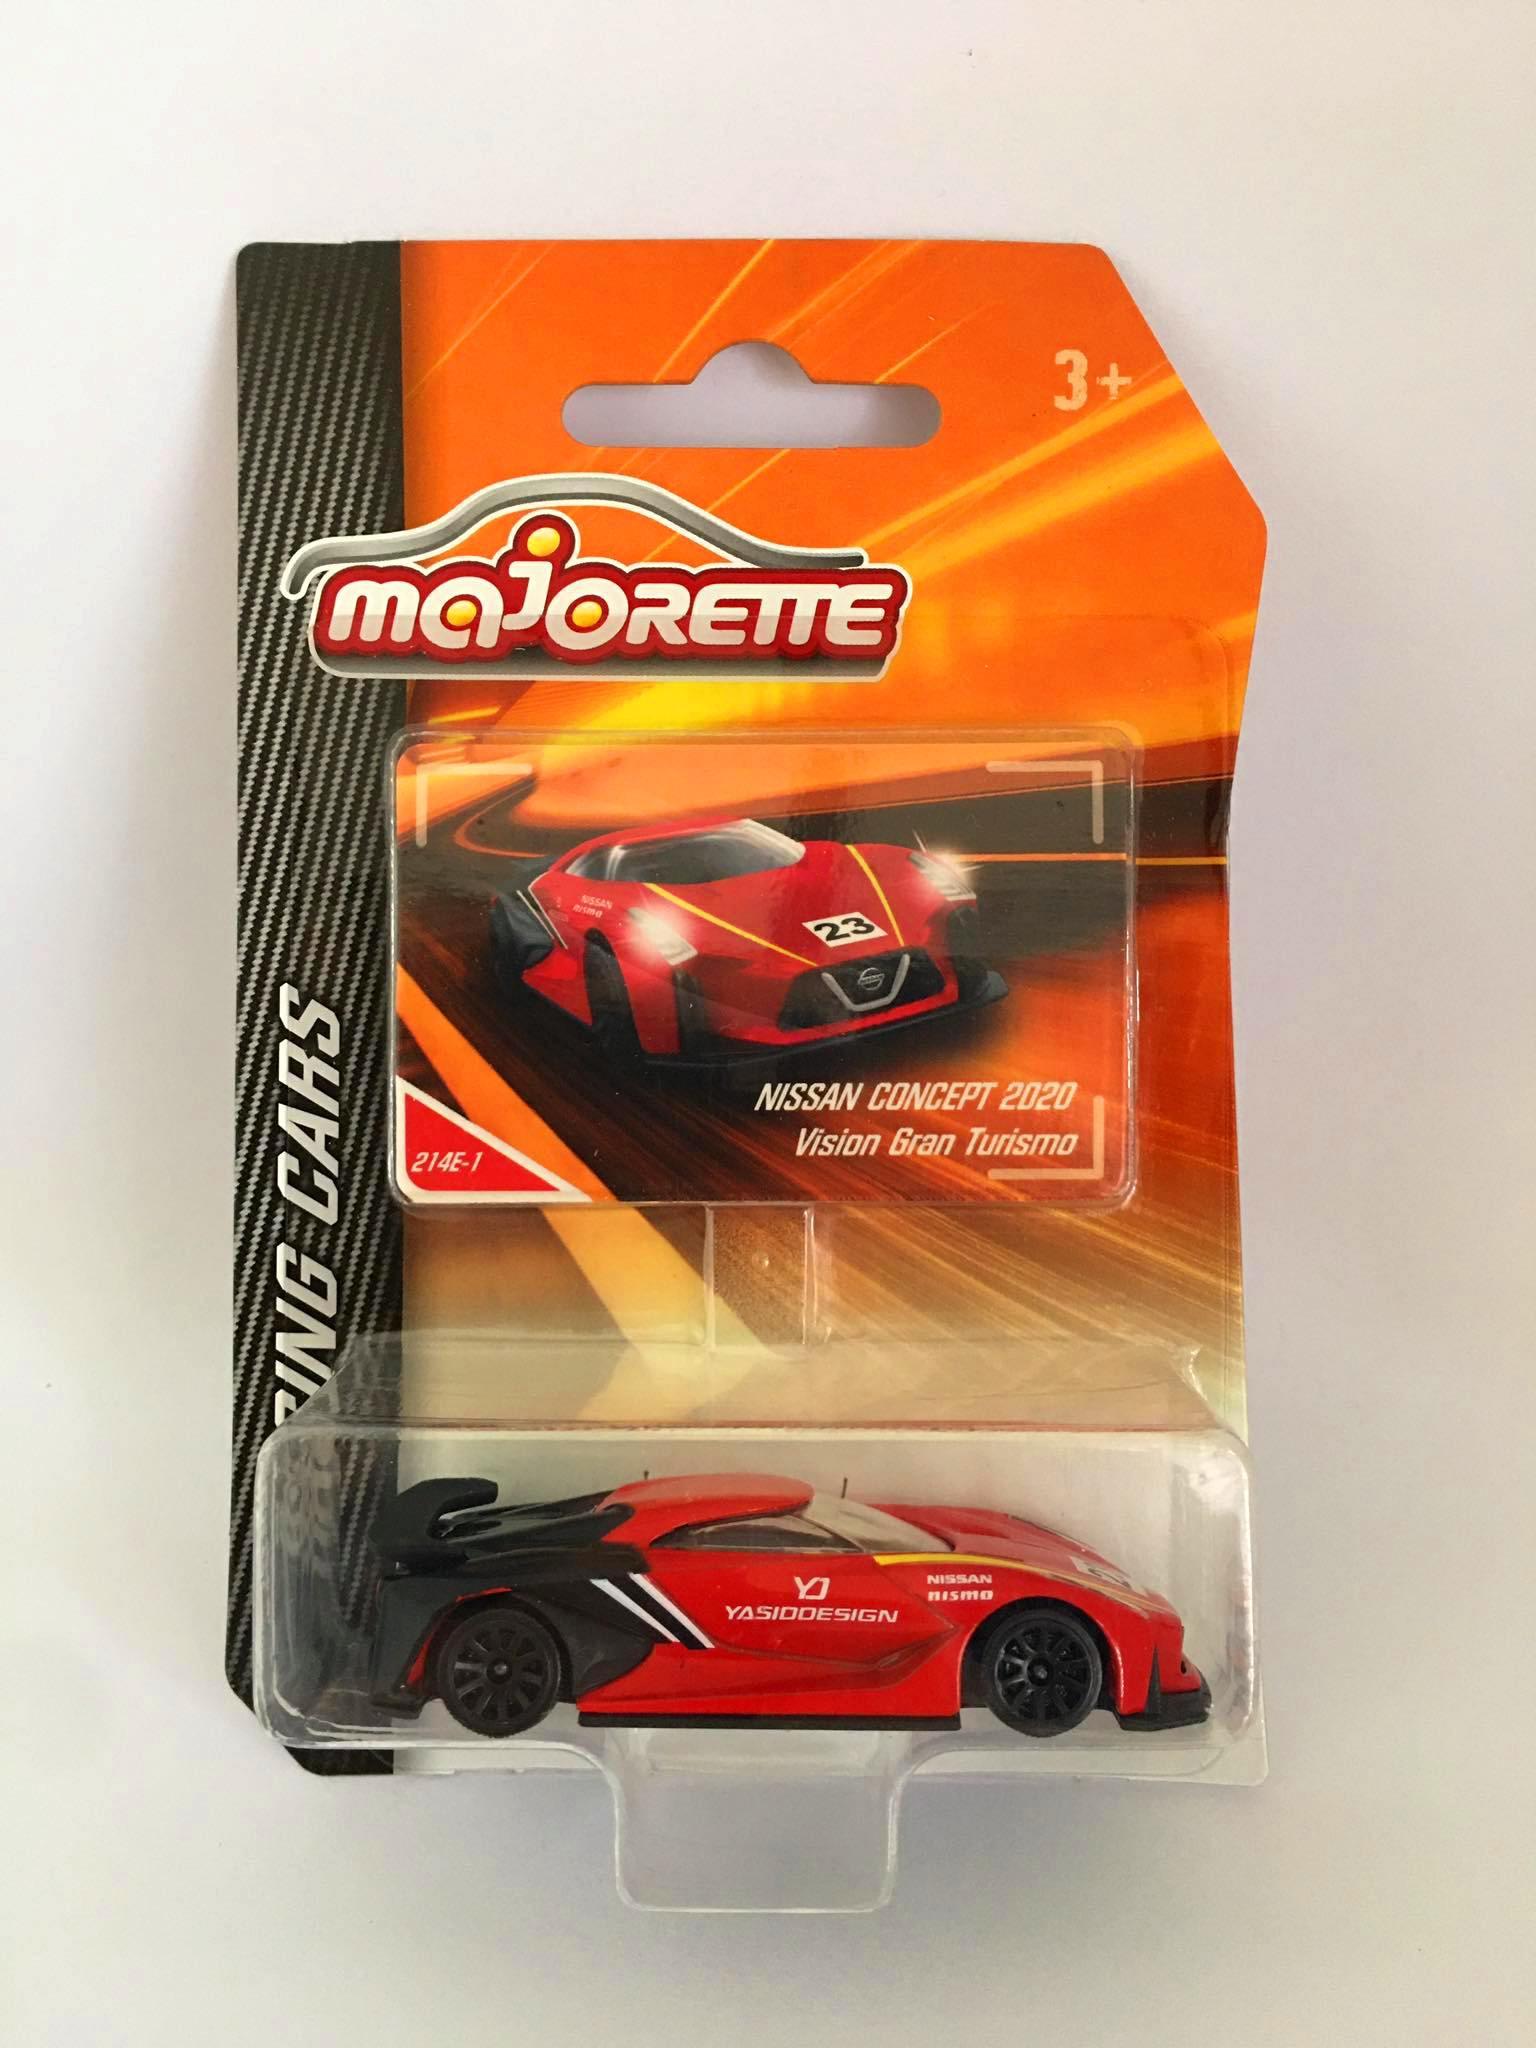 Majorette - Nissan Concept 2020 Vision Gran Turismo Vermelho - Racing Cars